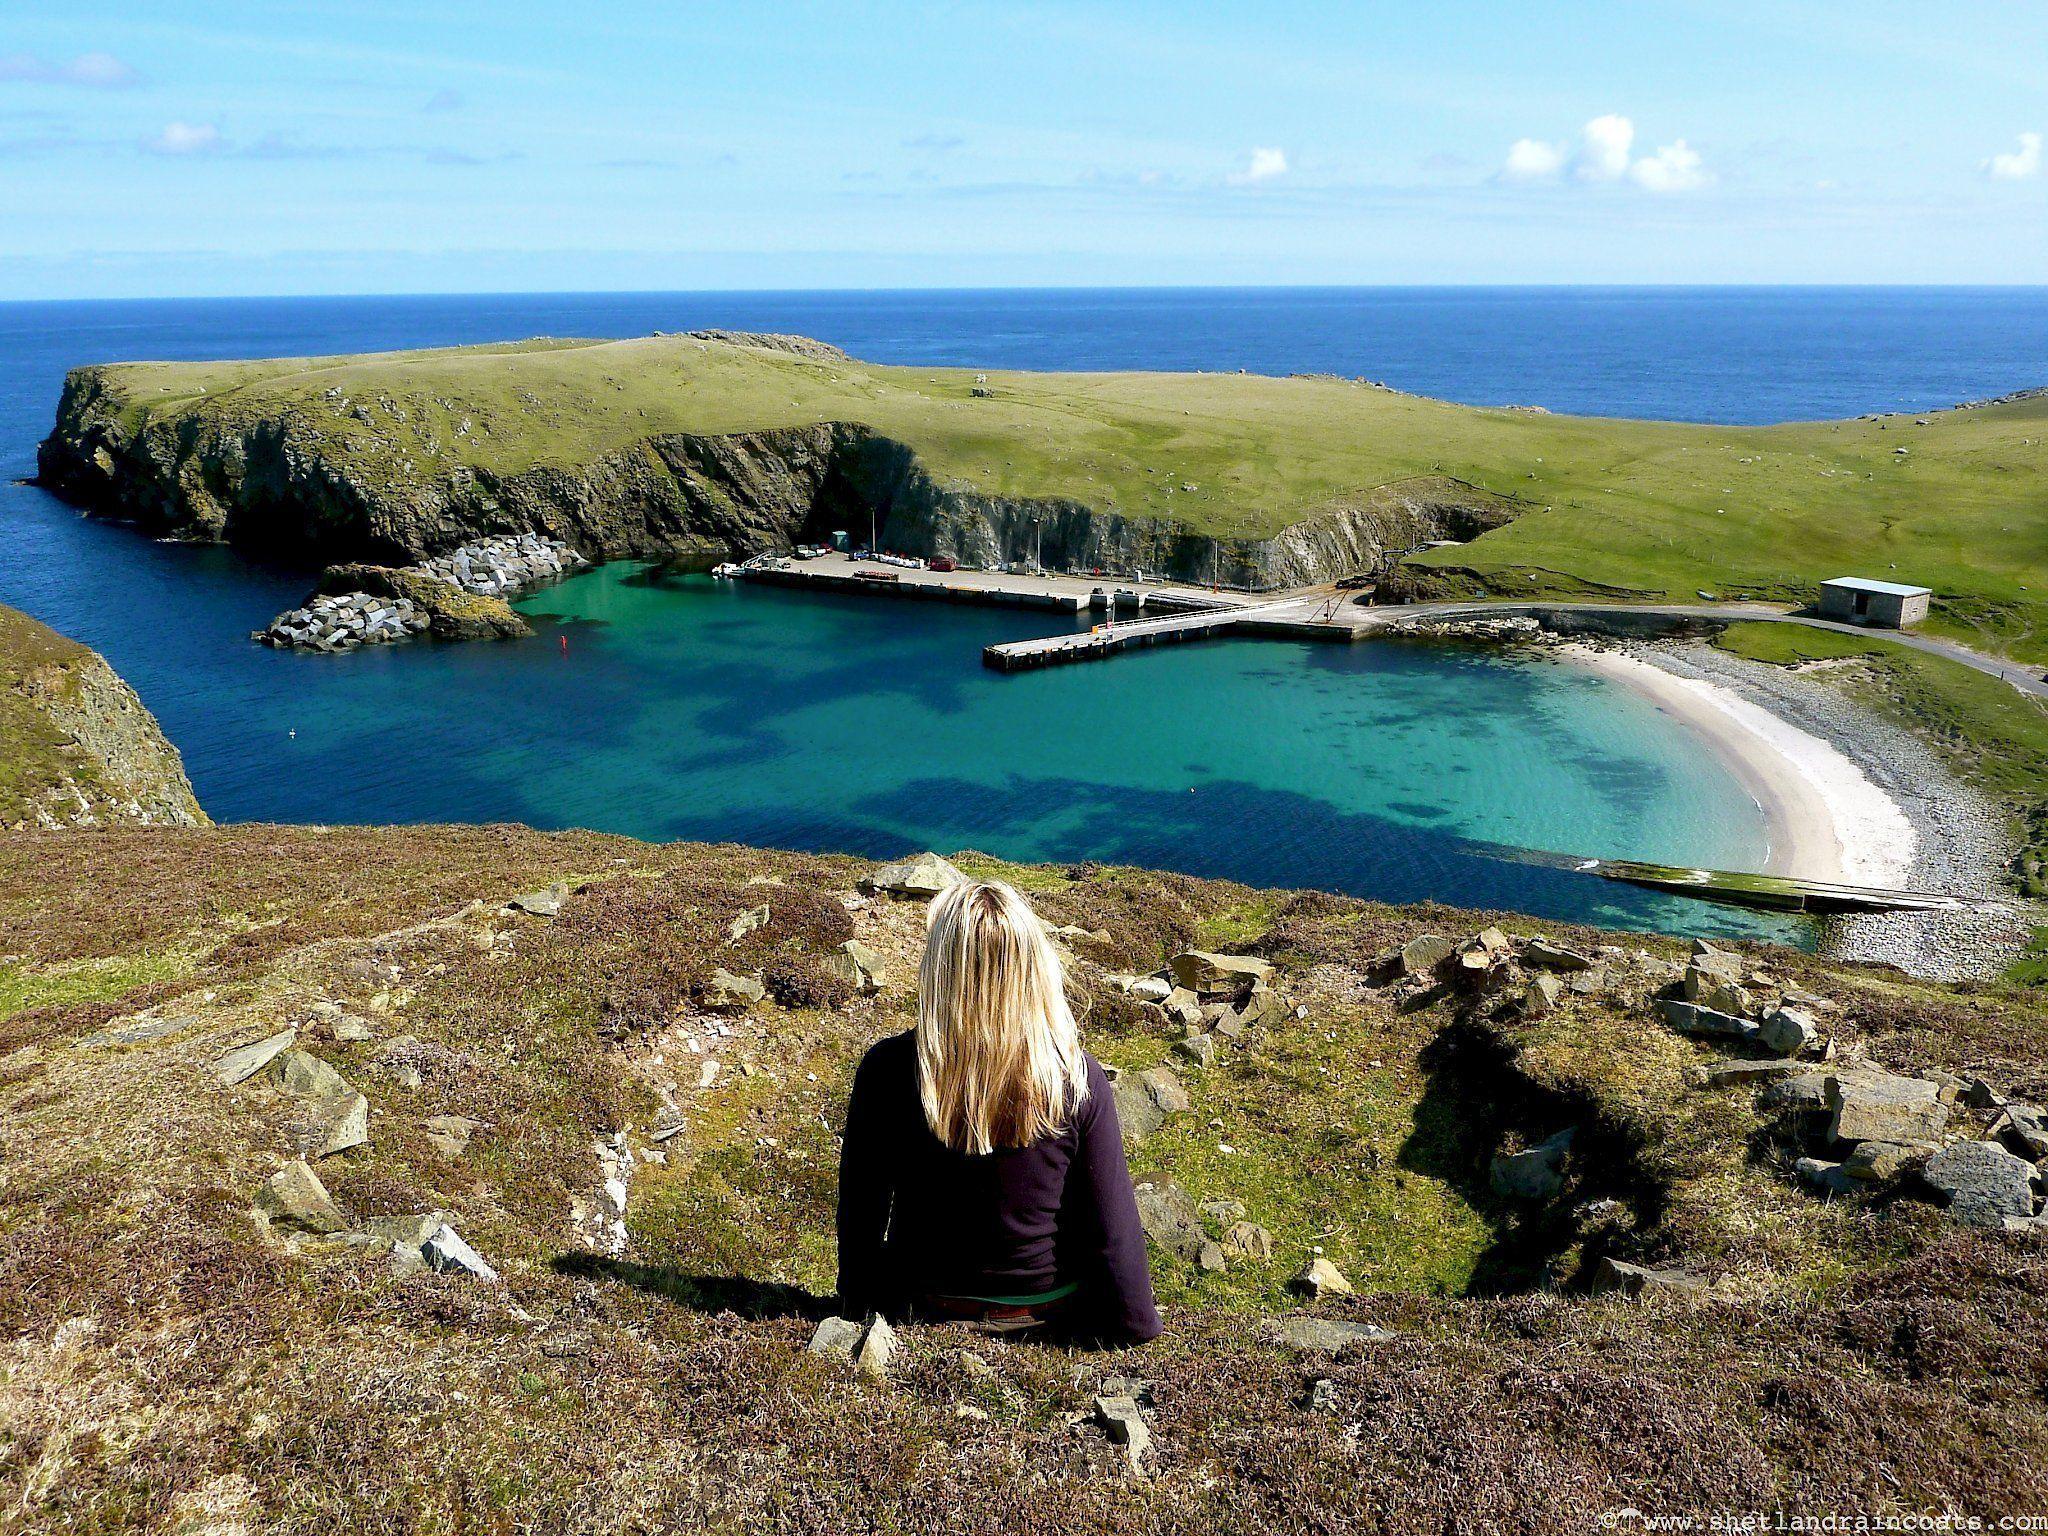 Shetland Islands Tourism #shetlandislands Shetland Islands Tourism #shetlandislands Shetland Islands Tourism #shetlandislands Shetland Islands Tourism #shetlandislands